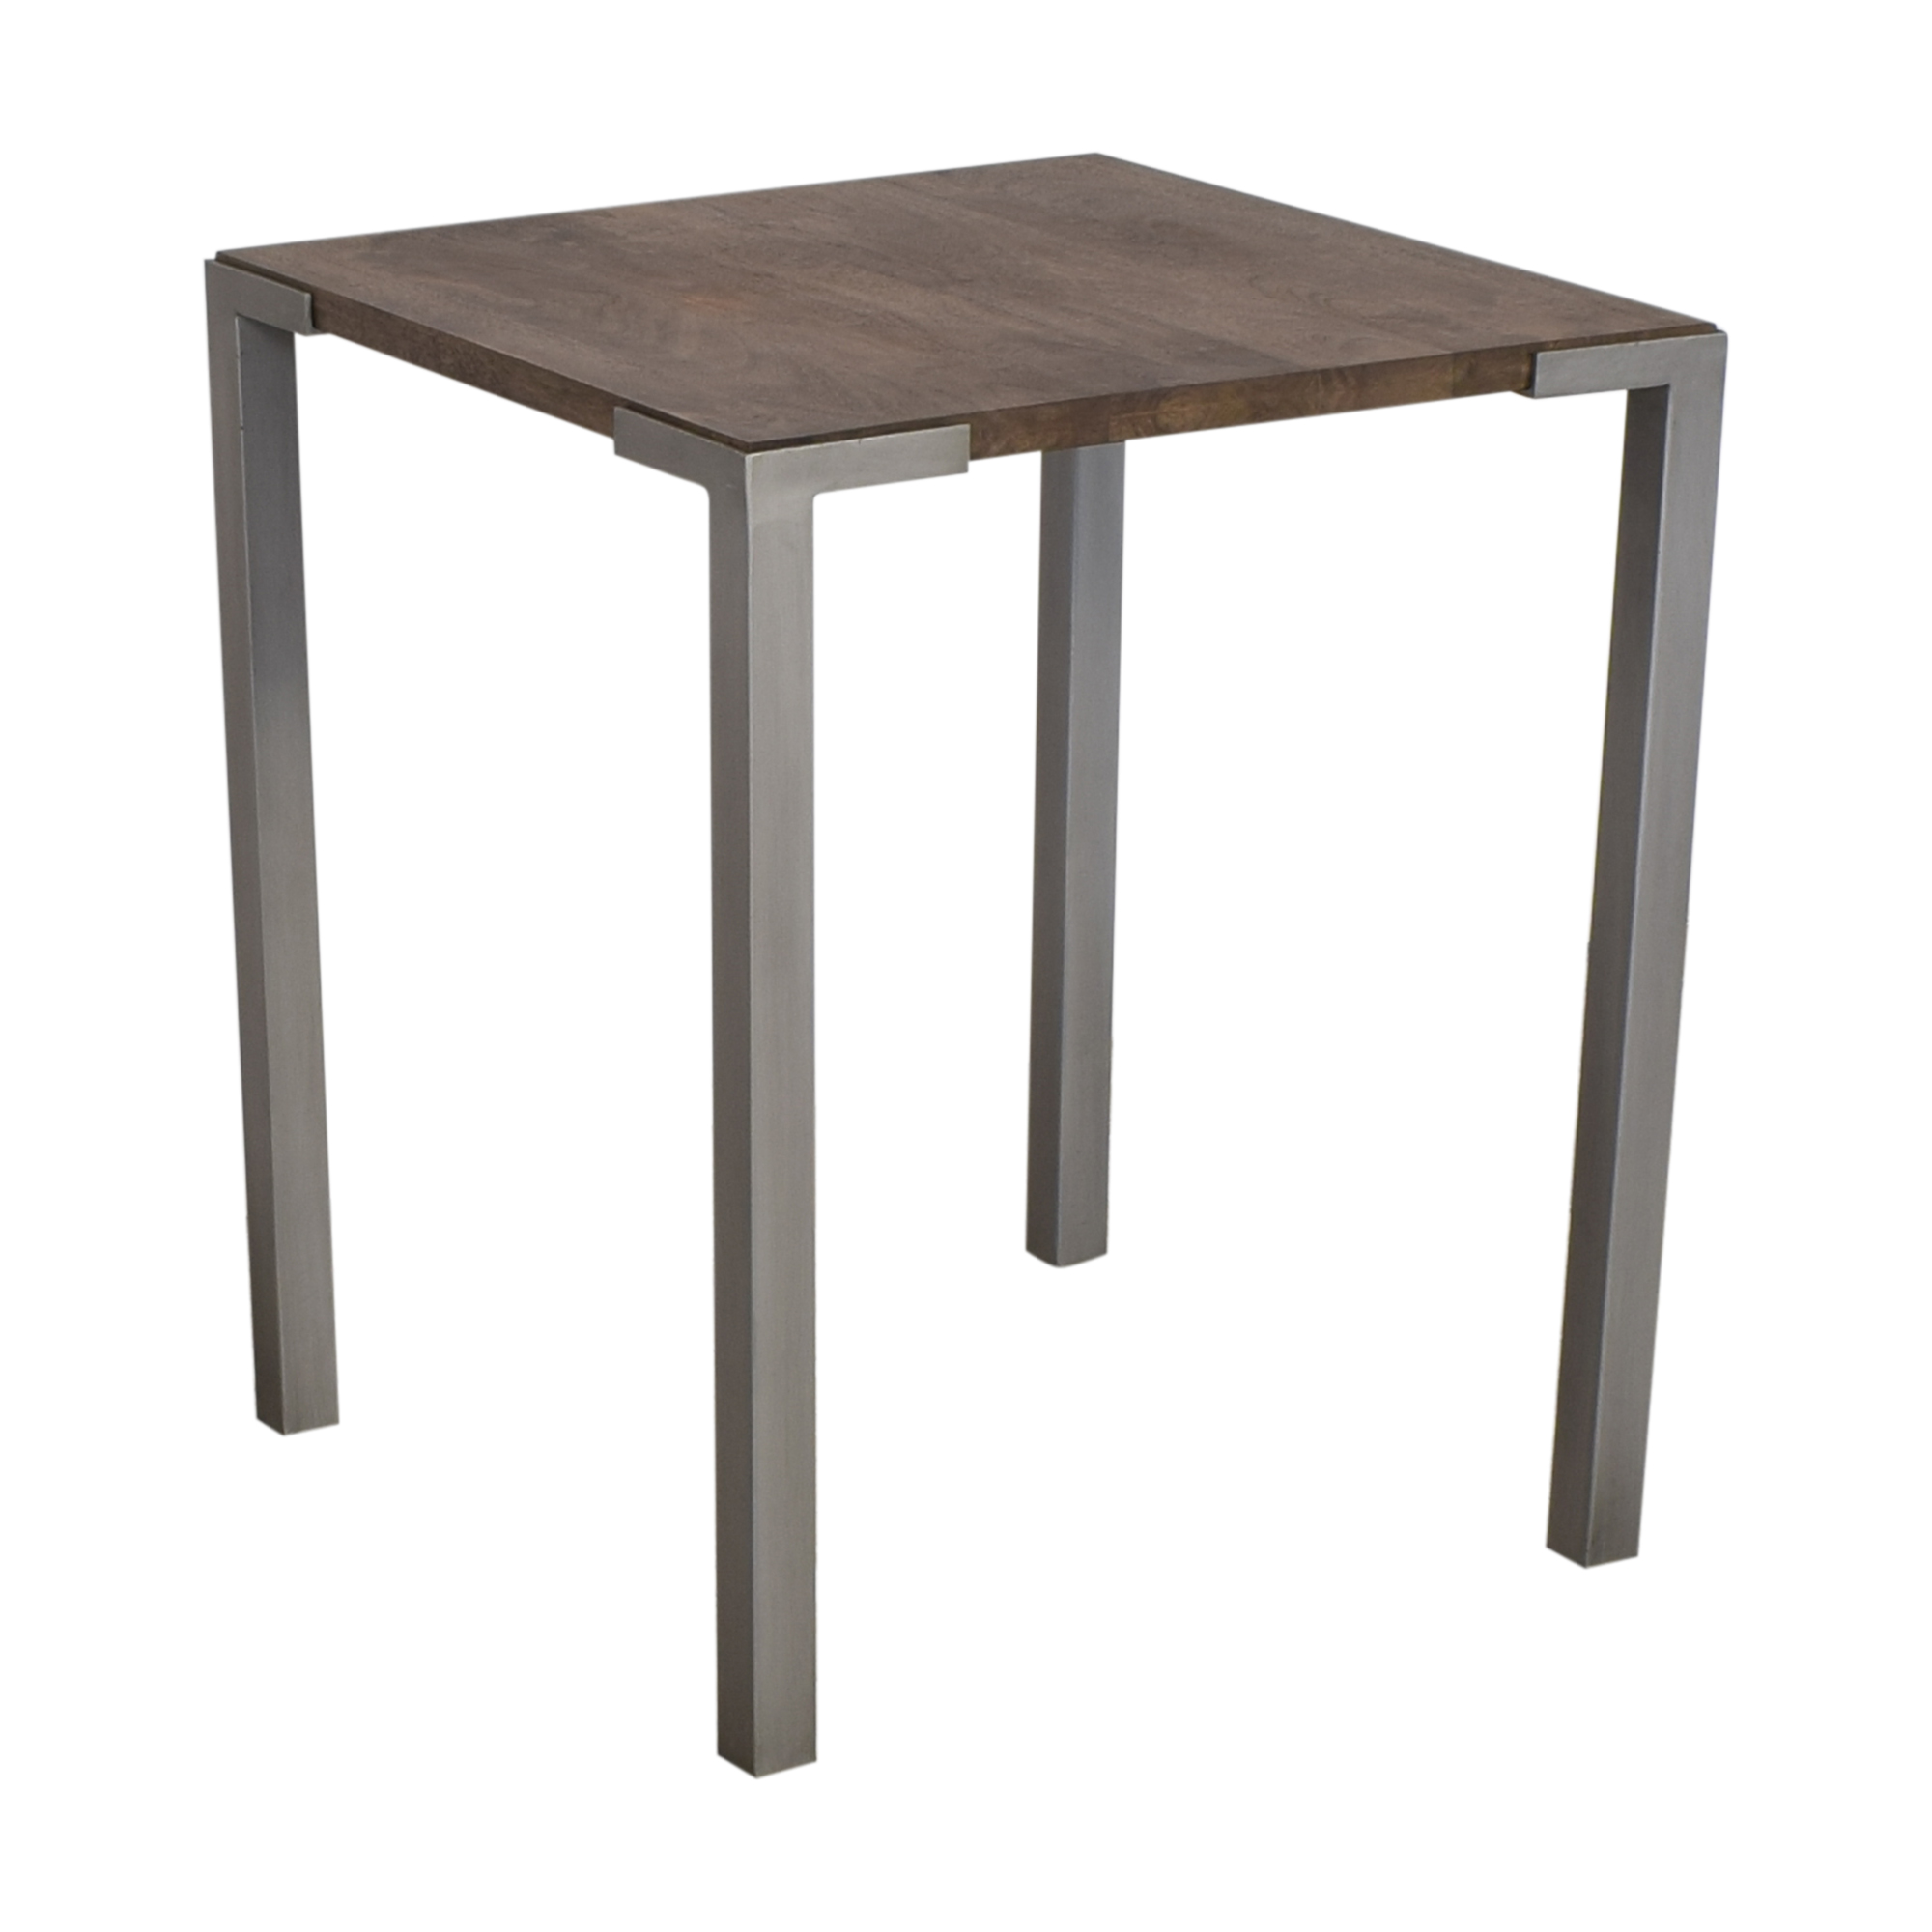 buy CB2 Stilt Dining Table CB2 Dinner Tables